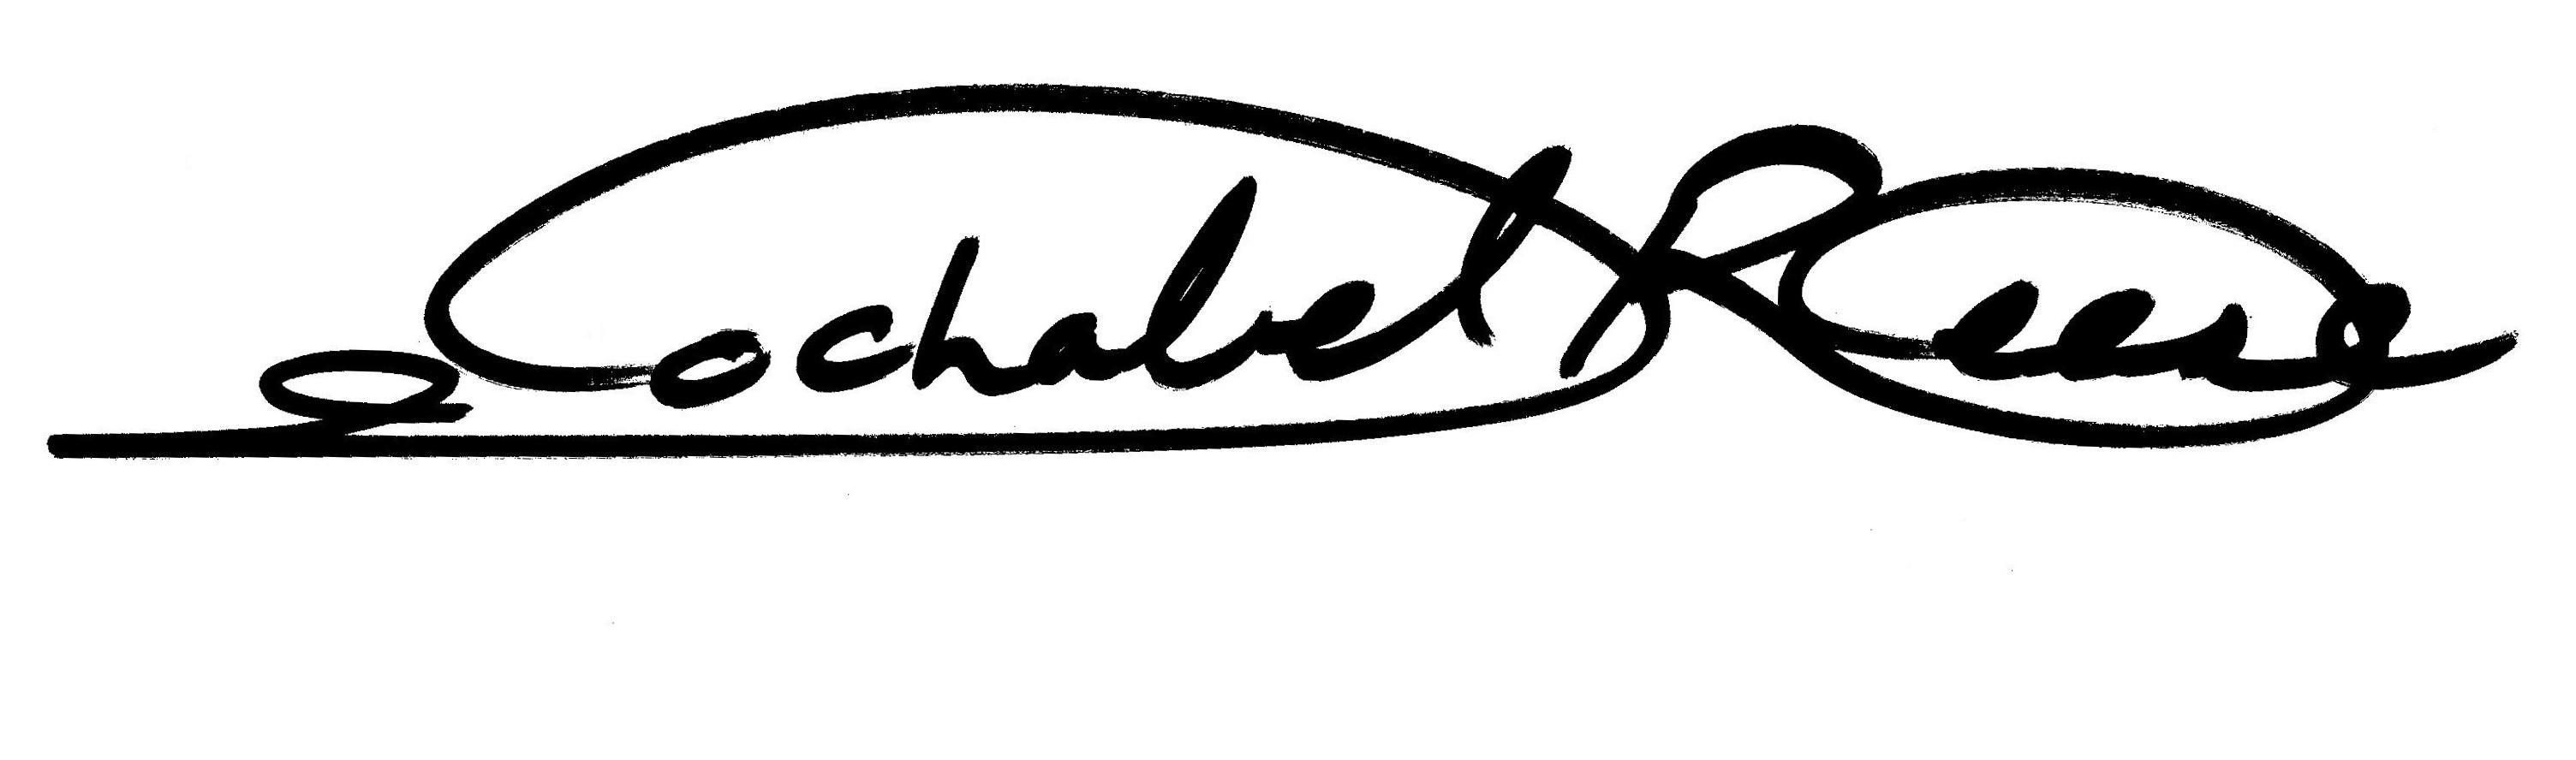 Jochabel Reese Signature